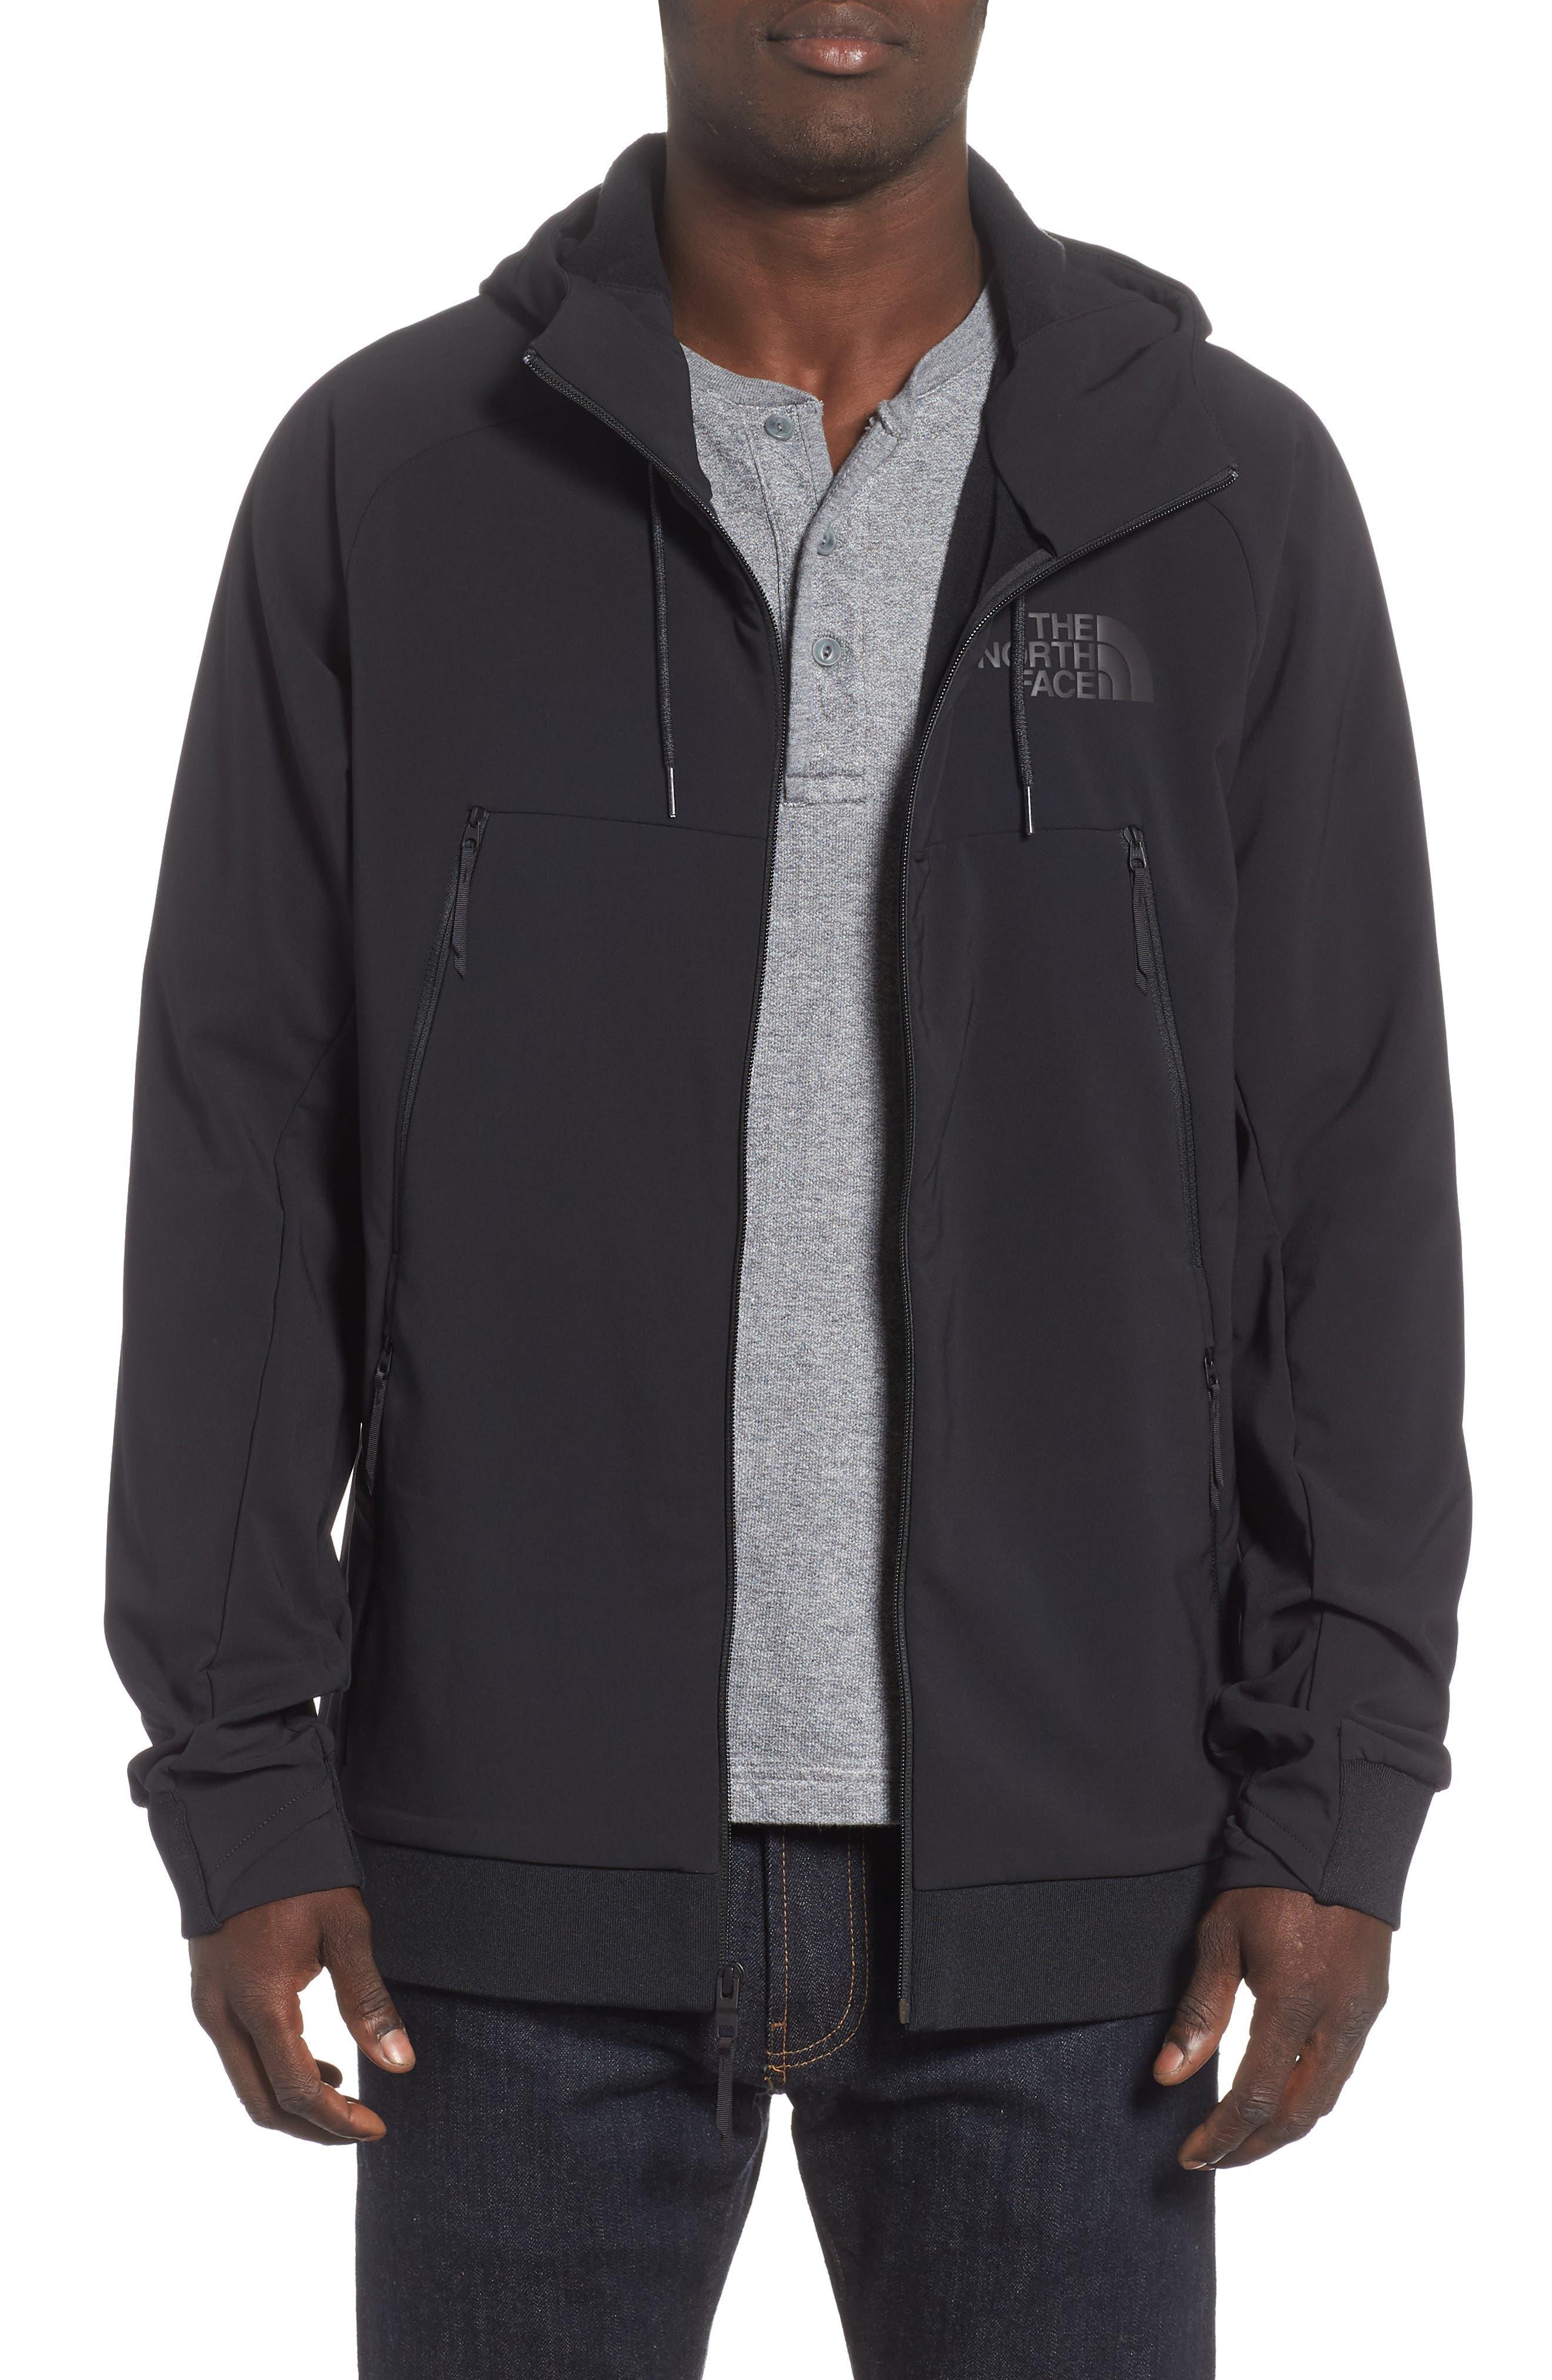 THE NORTH FACE Tekno Zip Jacket, Main, color, 001